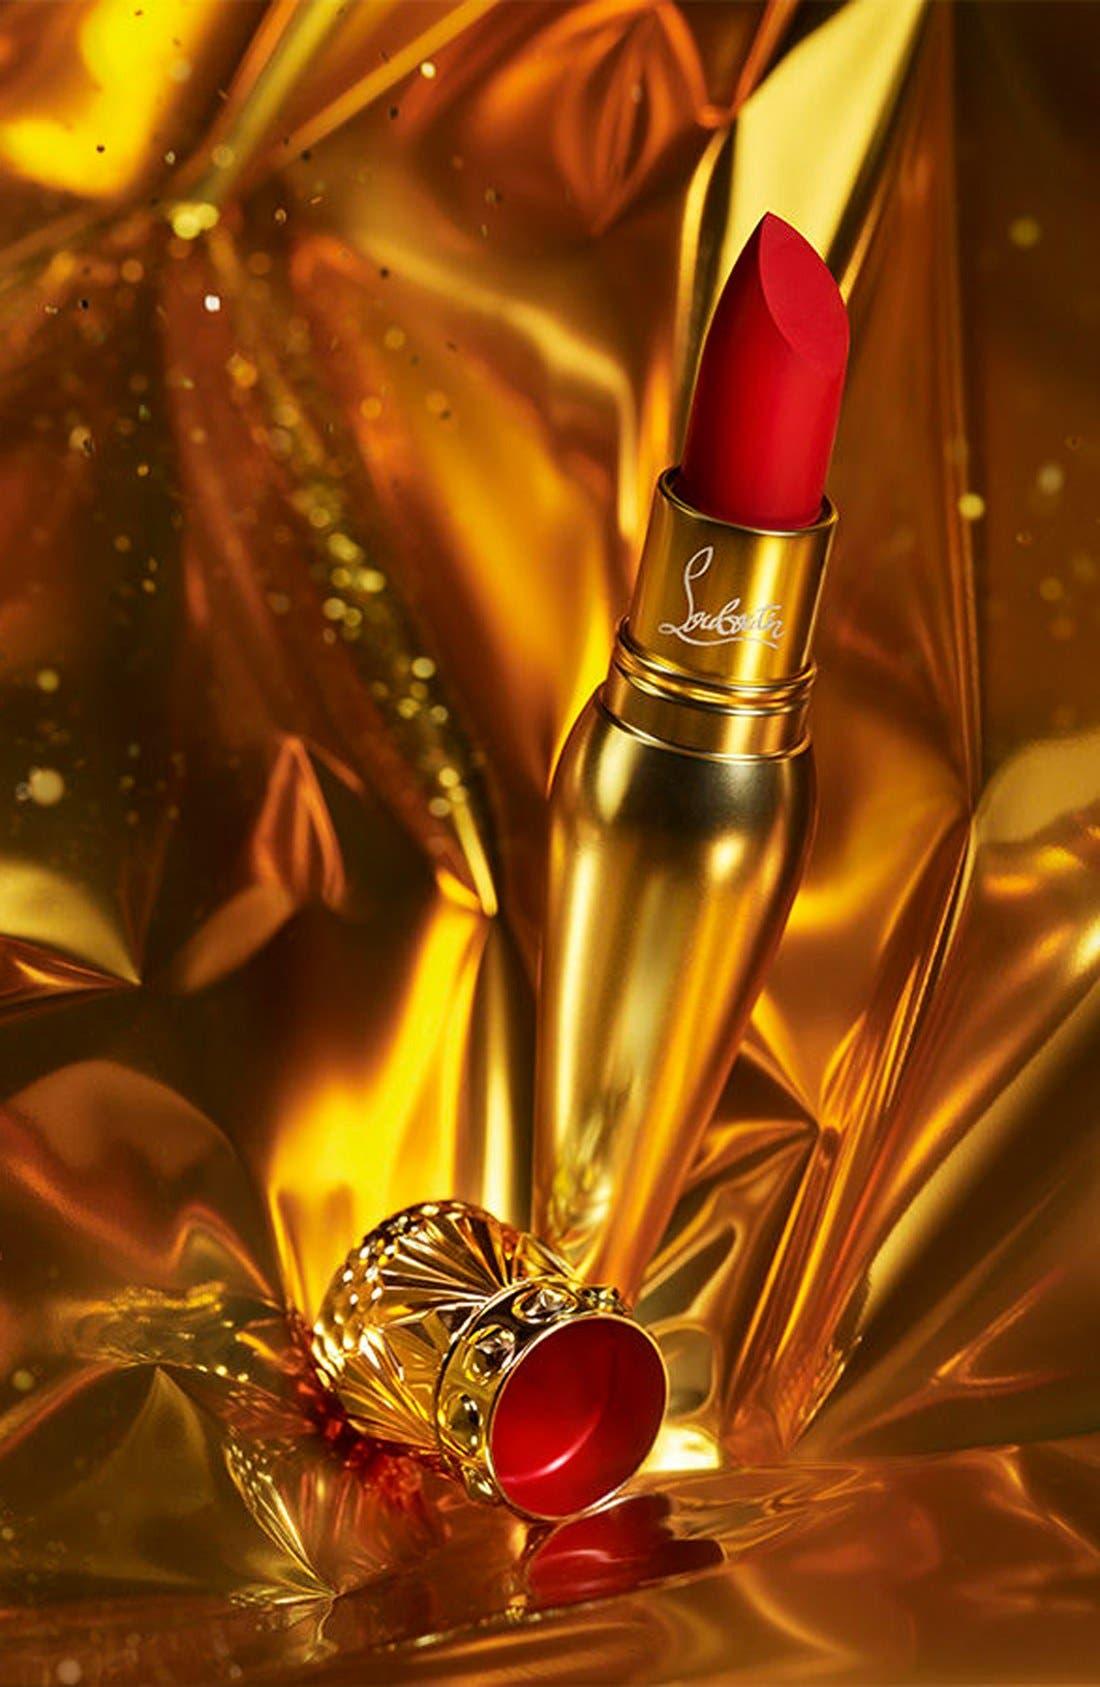 Rouge Louboutin Velvet Matte Lip Colour,                             Alternate thumbnail 50, color,